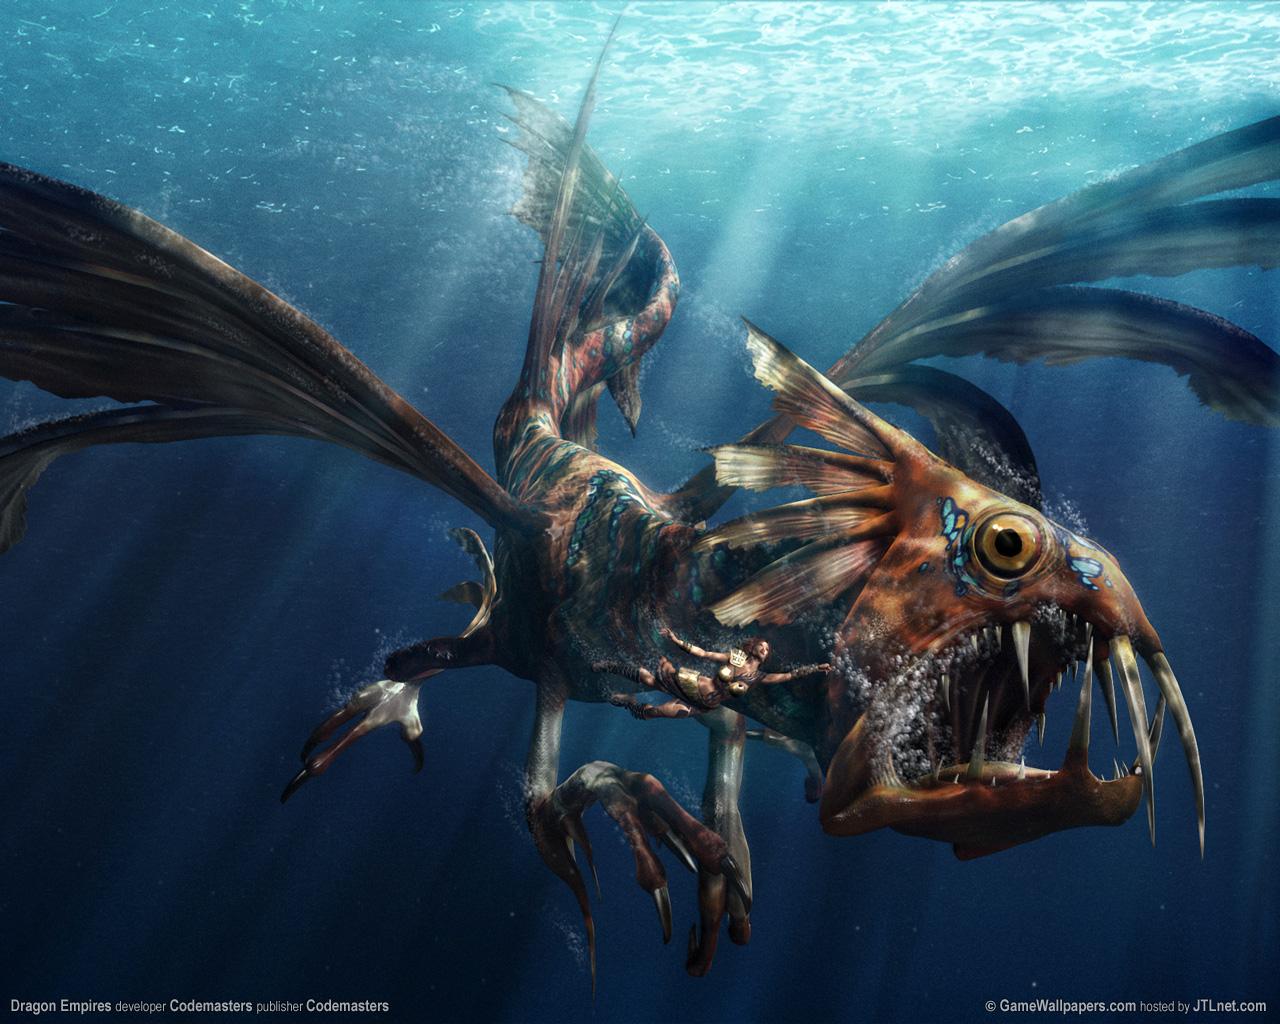 wallpaper dragon empires 01 1280